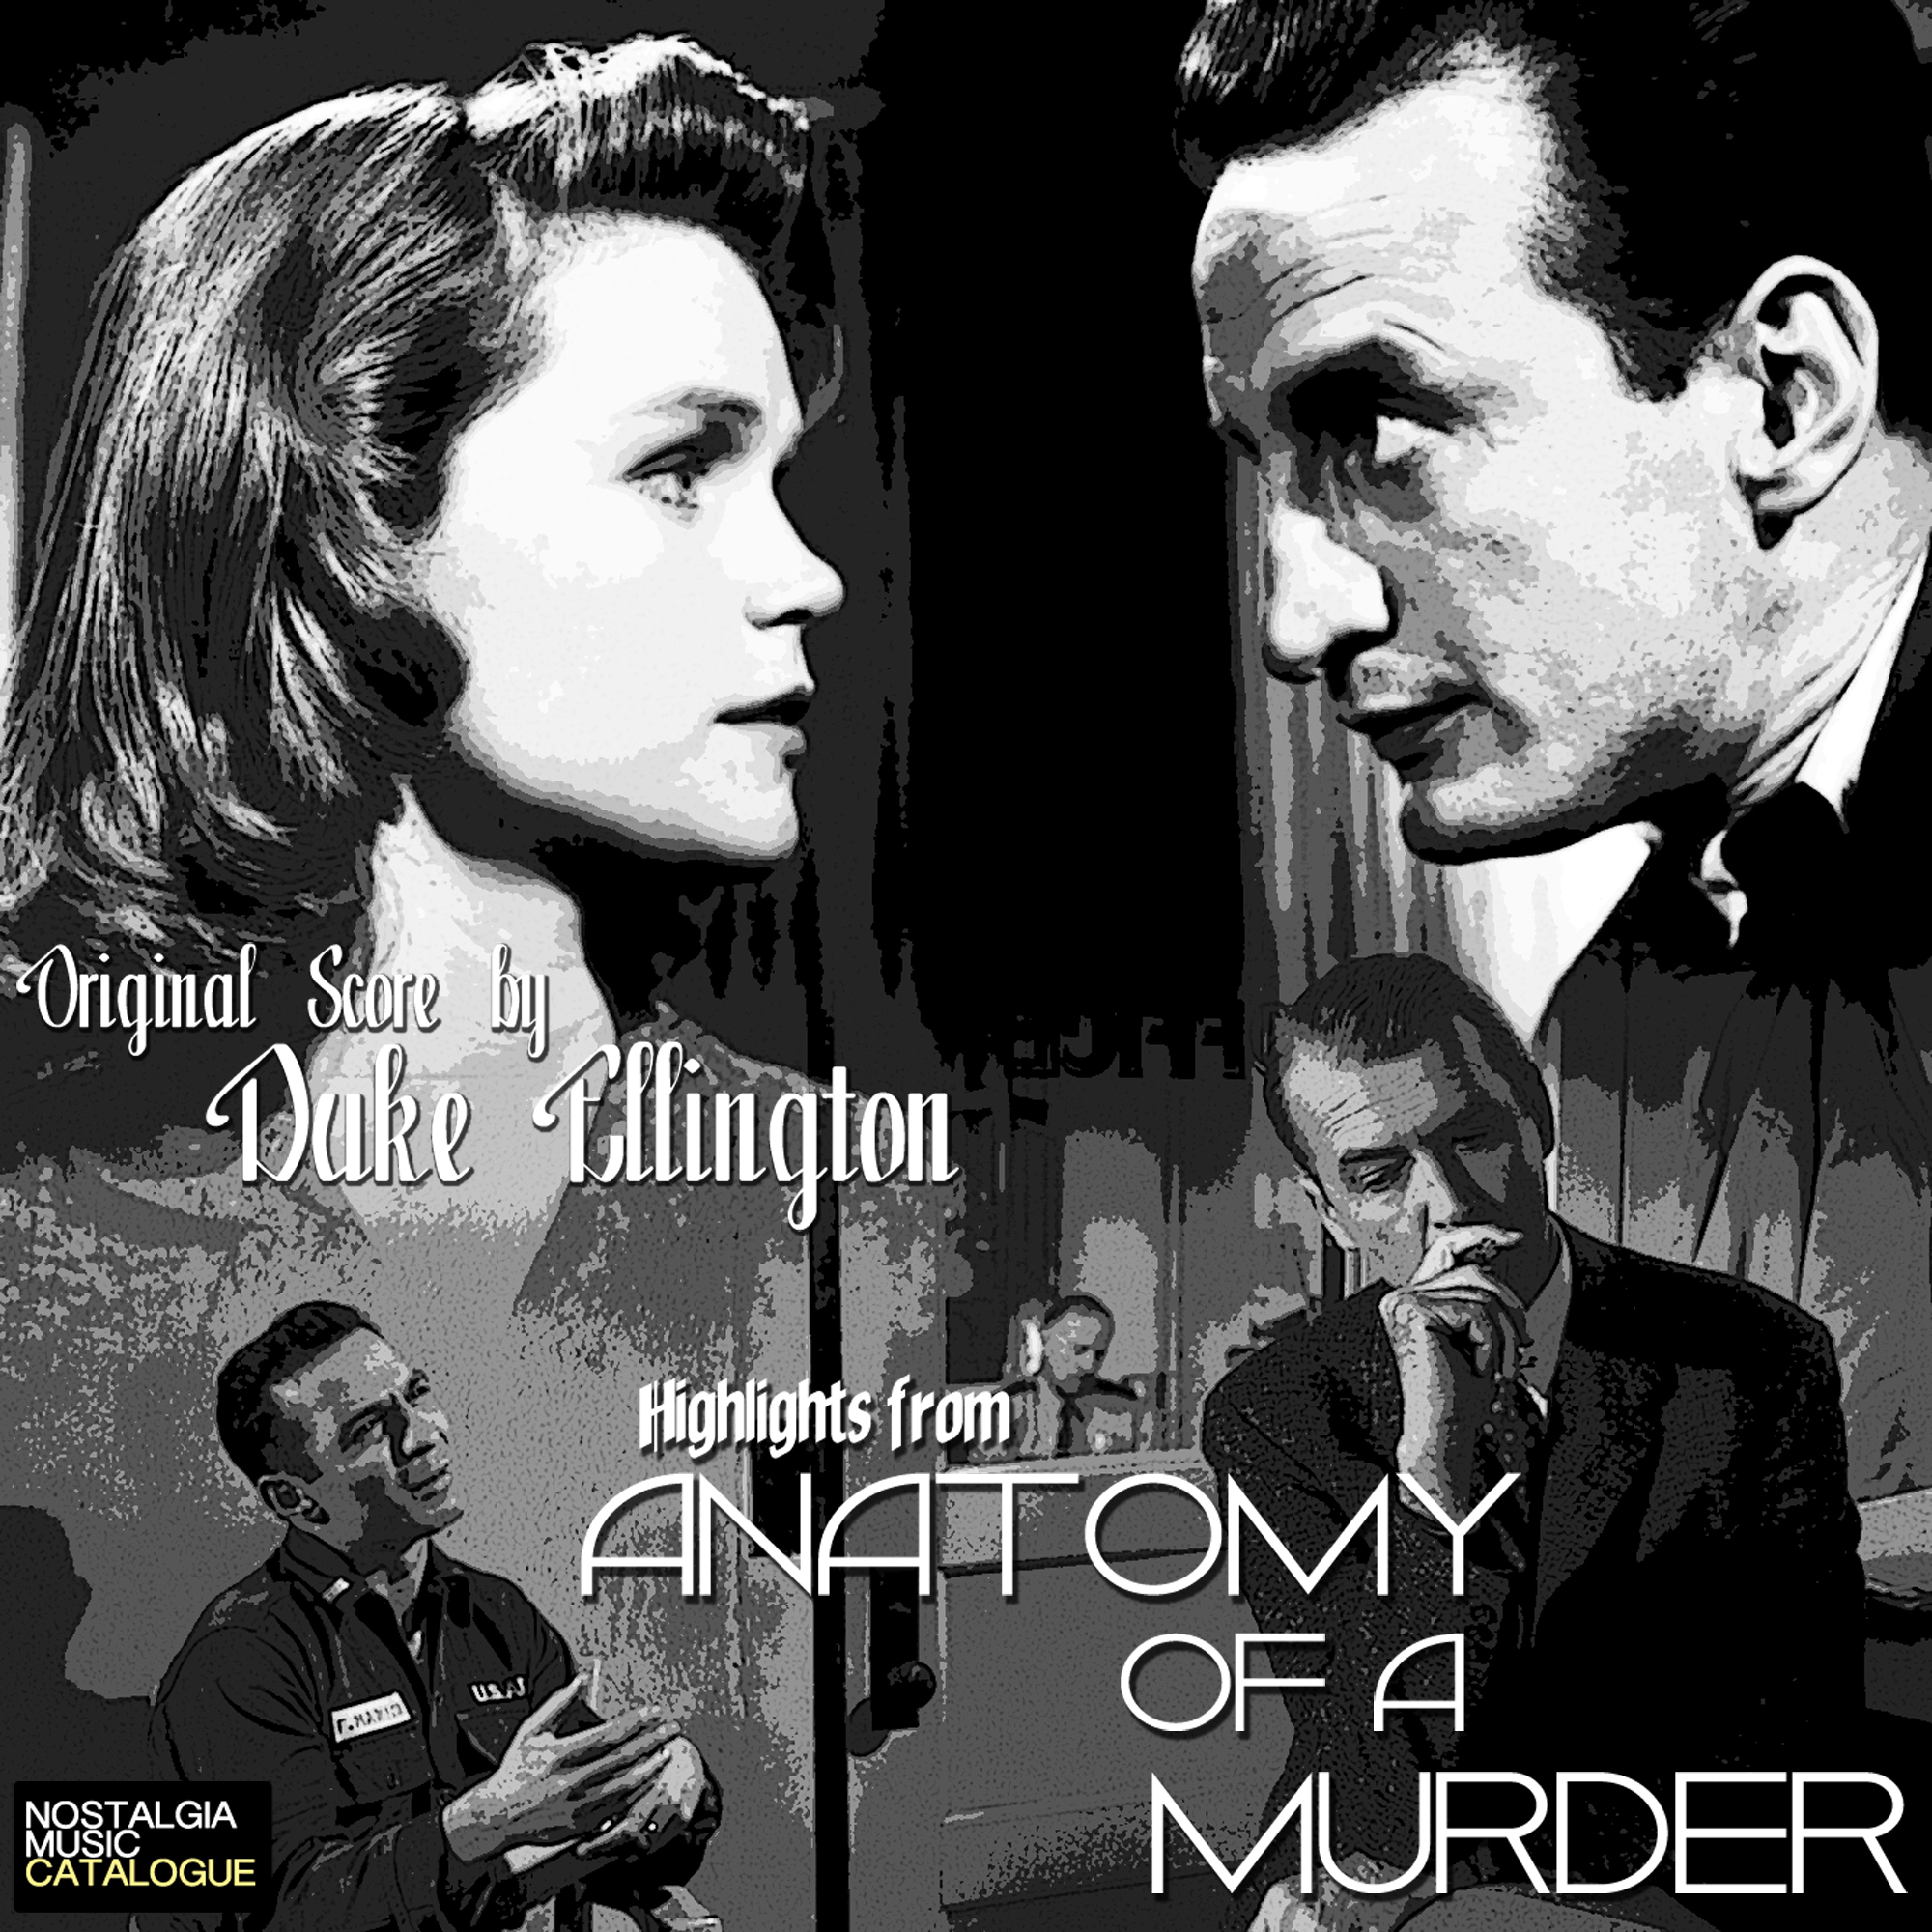 Highlights from Anatomy of a Murder - Duke Ellington - Nostalgia Music